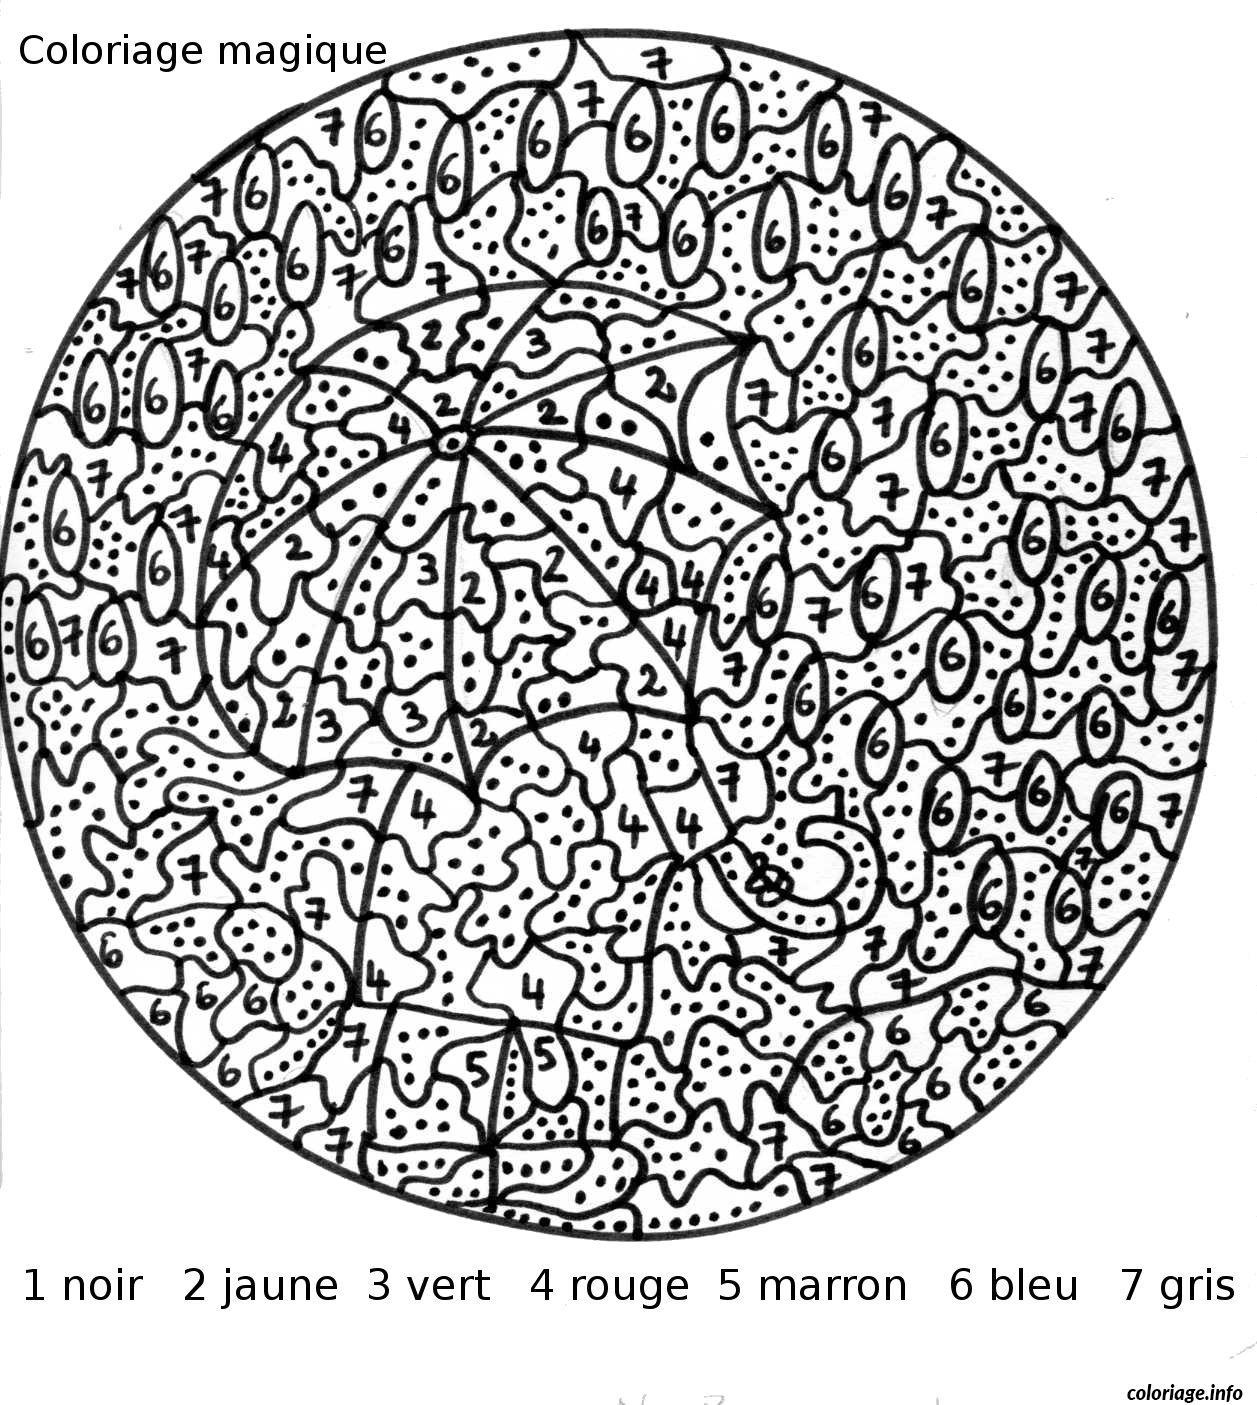 Coloriage Magique 113 dessin